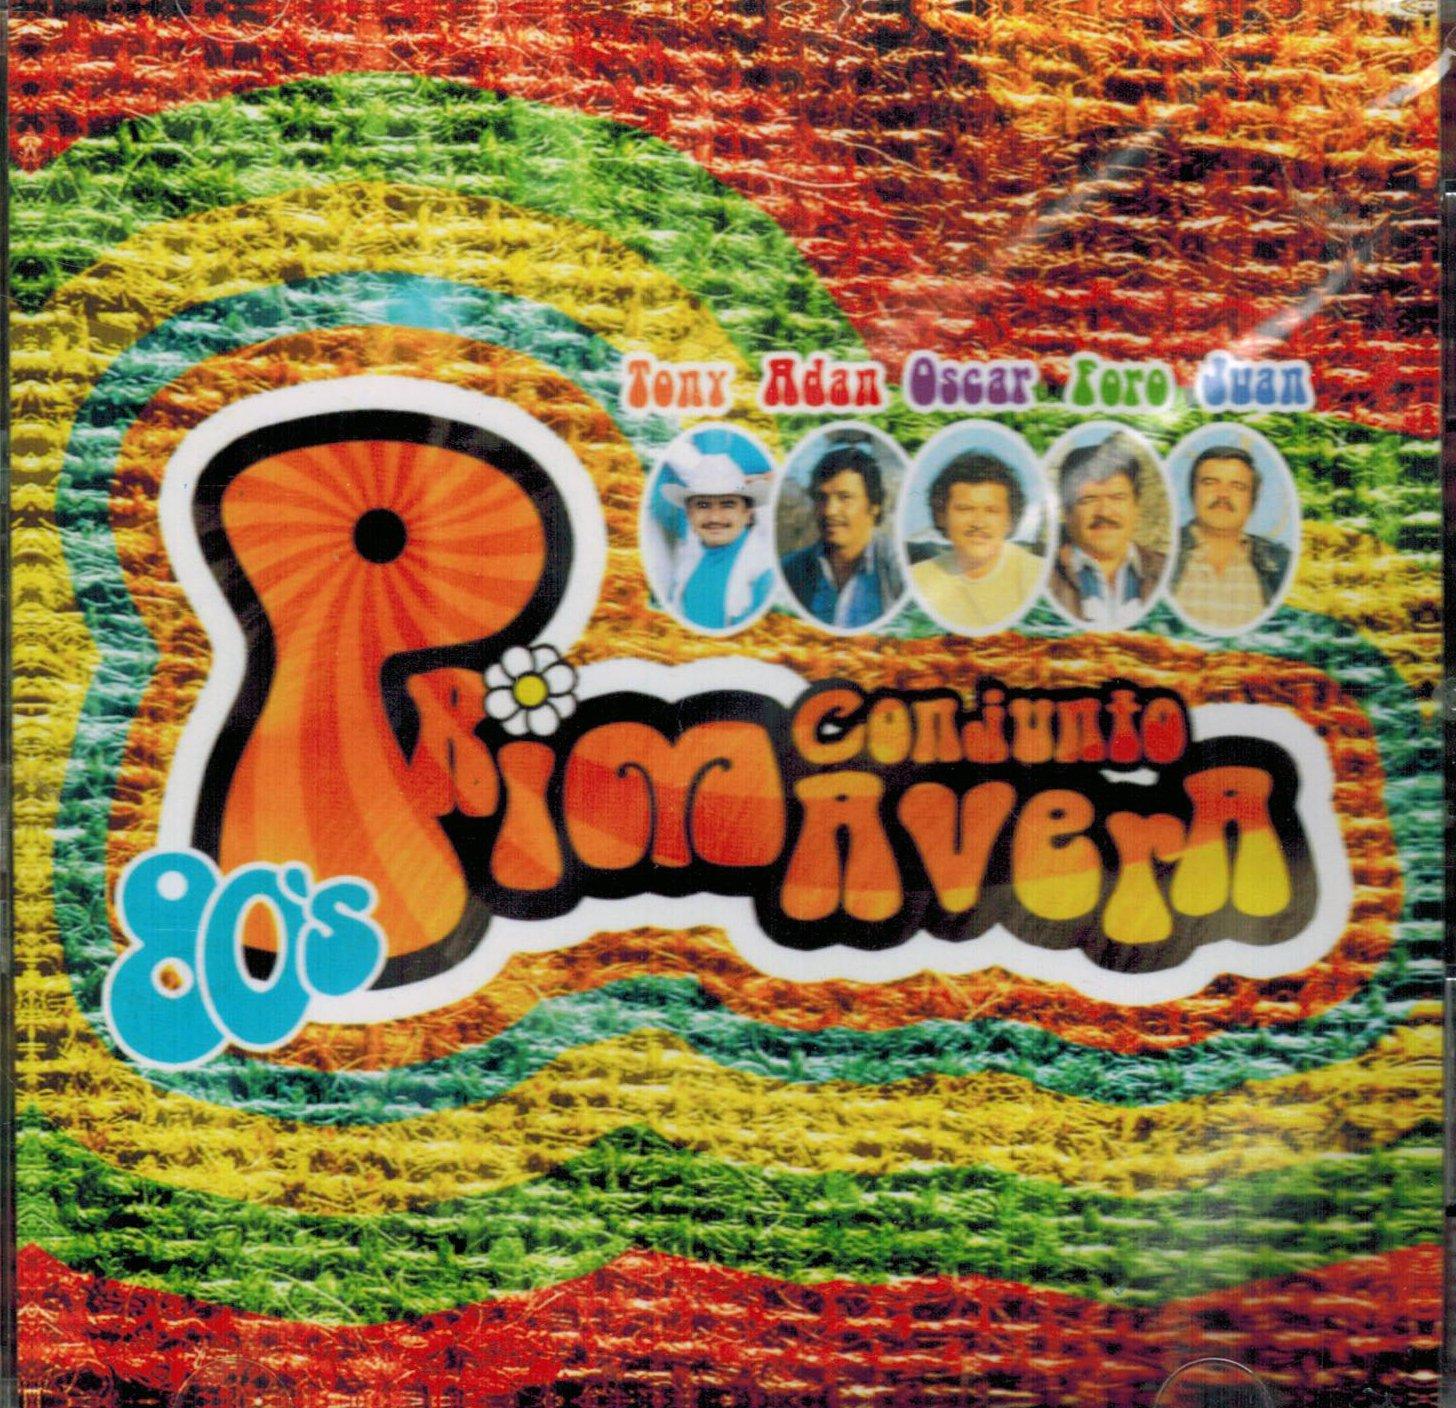 Conjunto Primavera (80's Joey-7124)